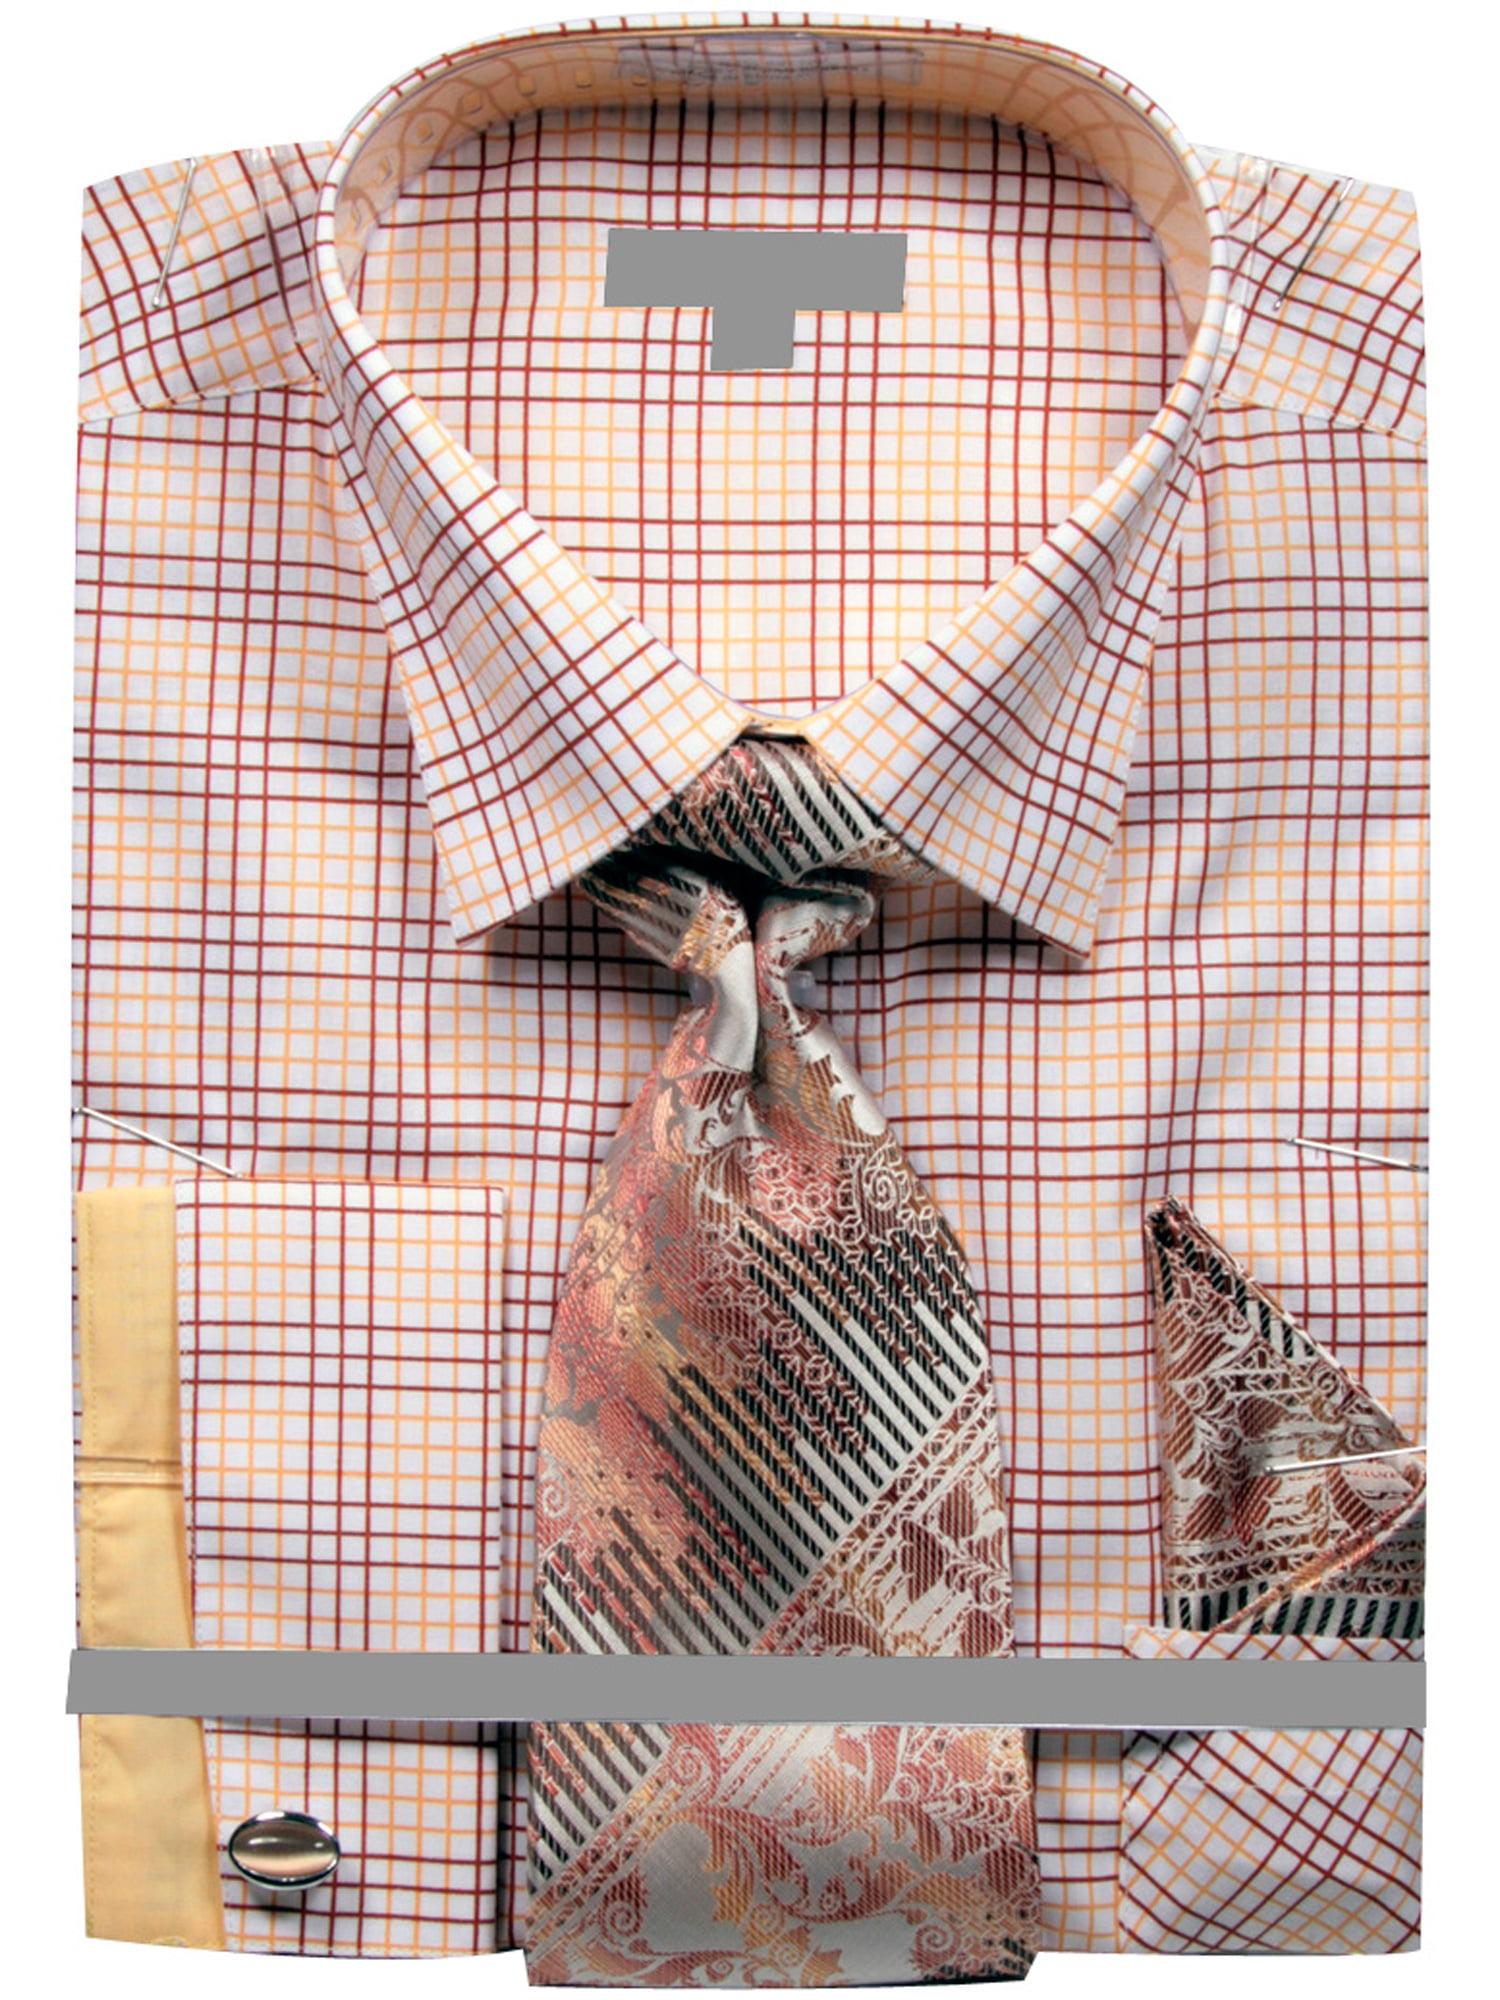 Men/'s Grid Checker Pattern French Cuff Shirt Tie Handkerchief Cuff Links